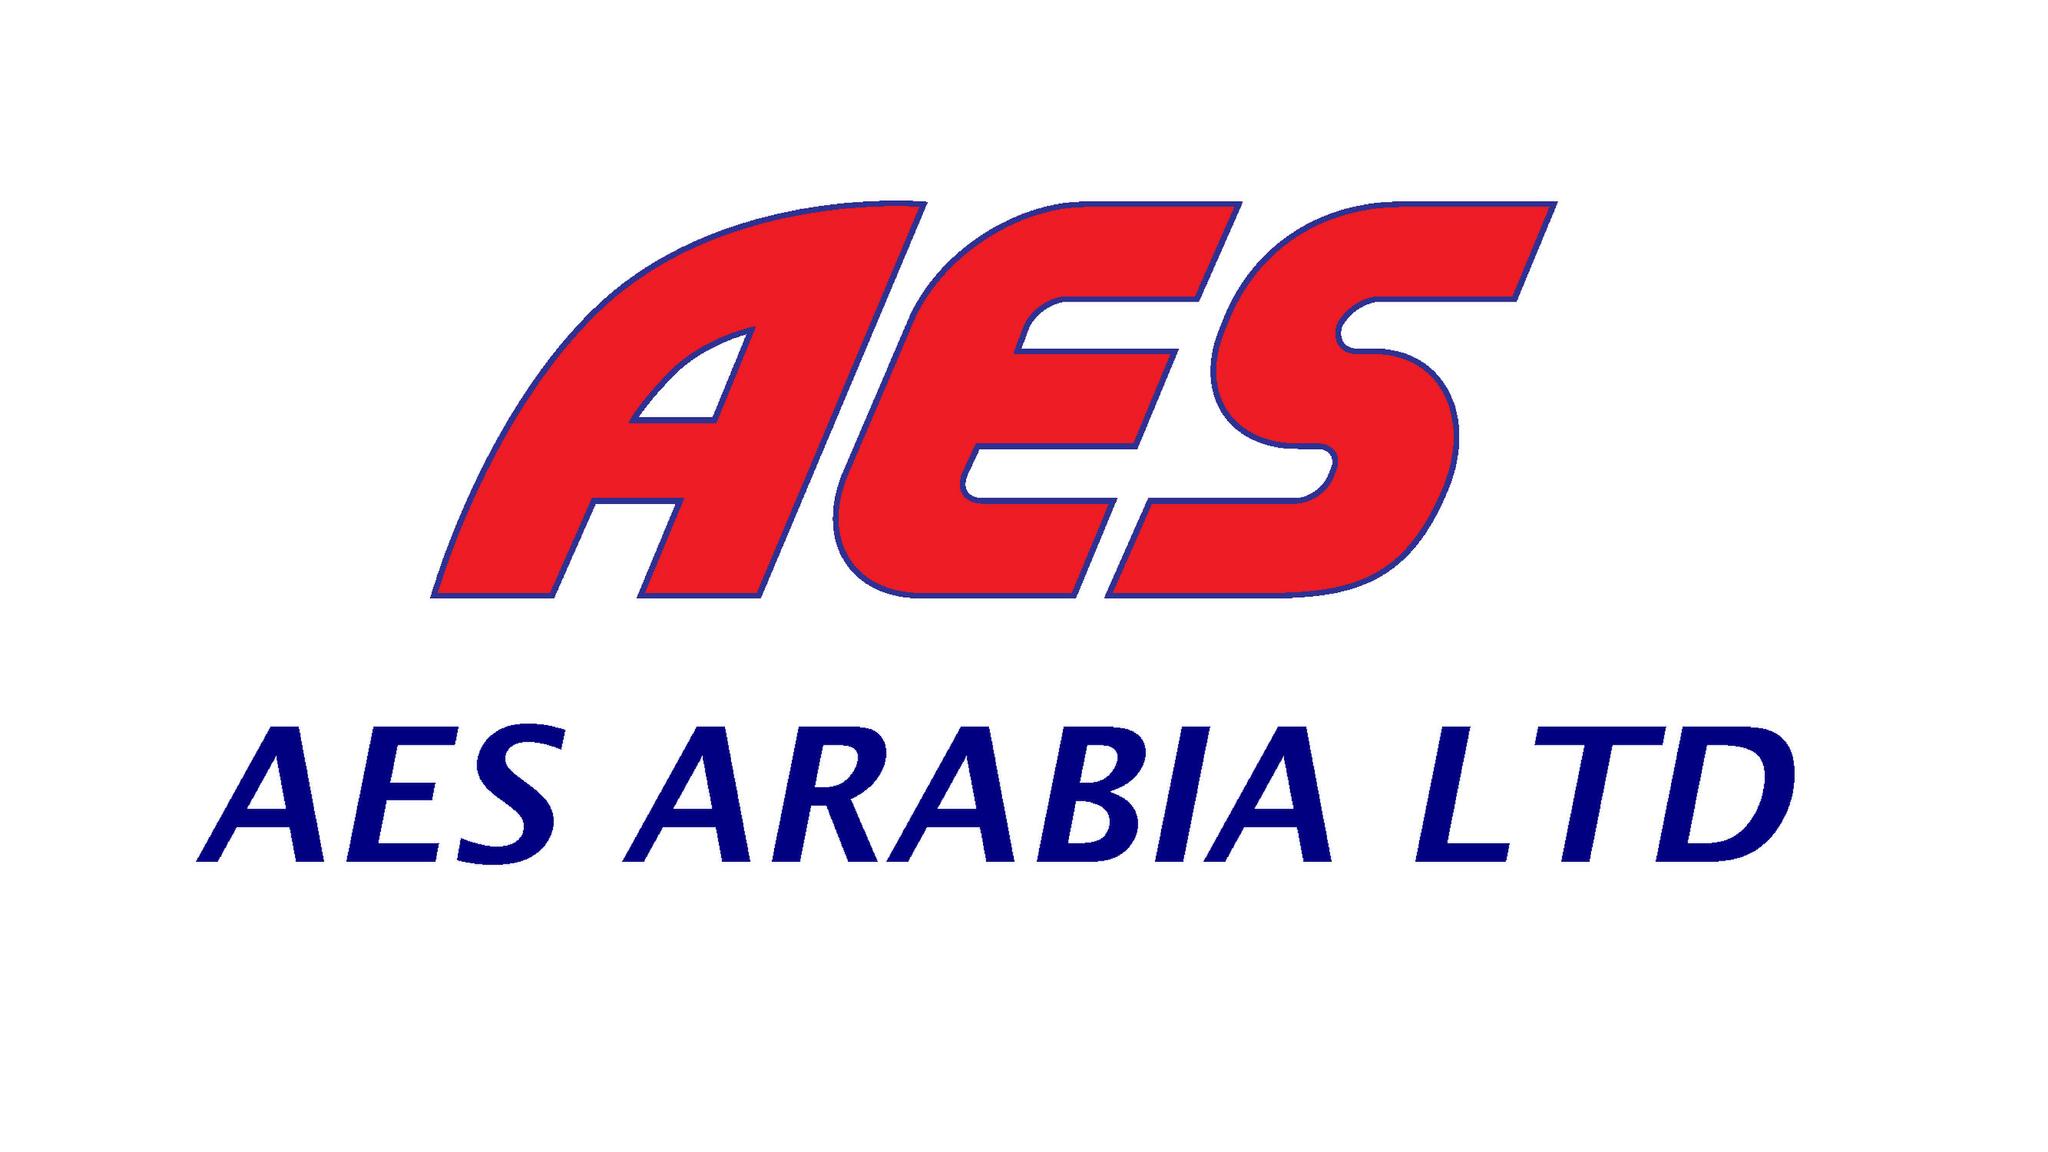 AES ARABIA LTD.